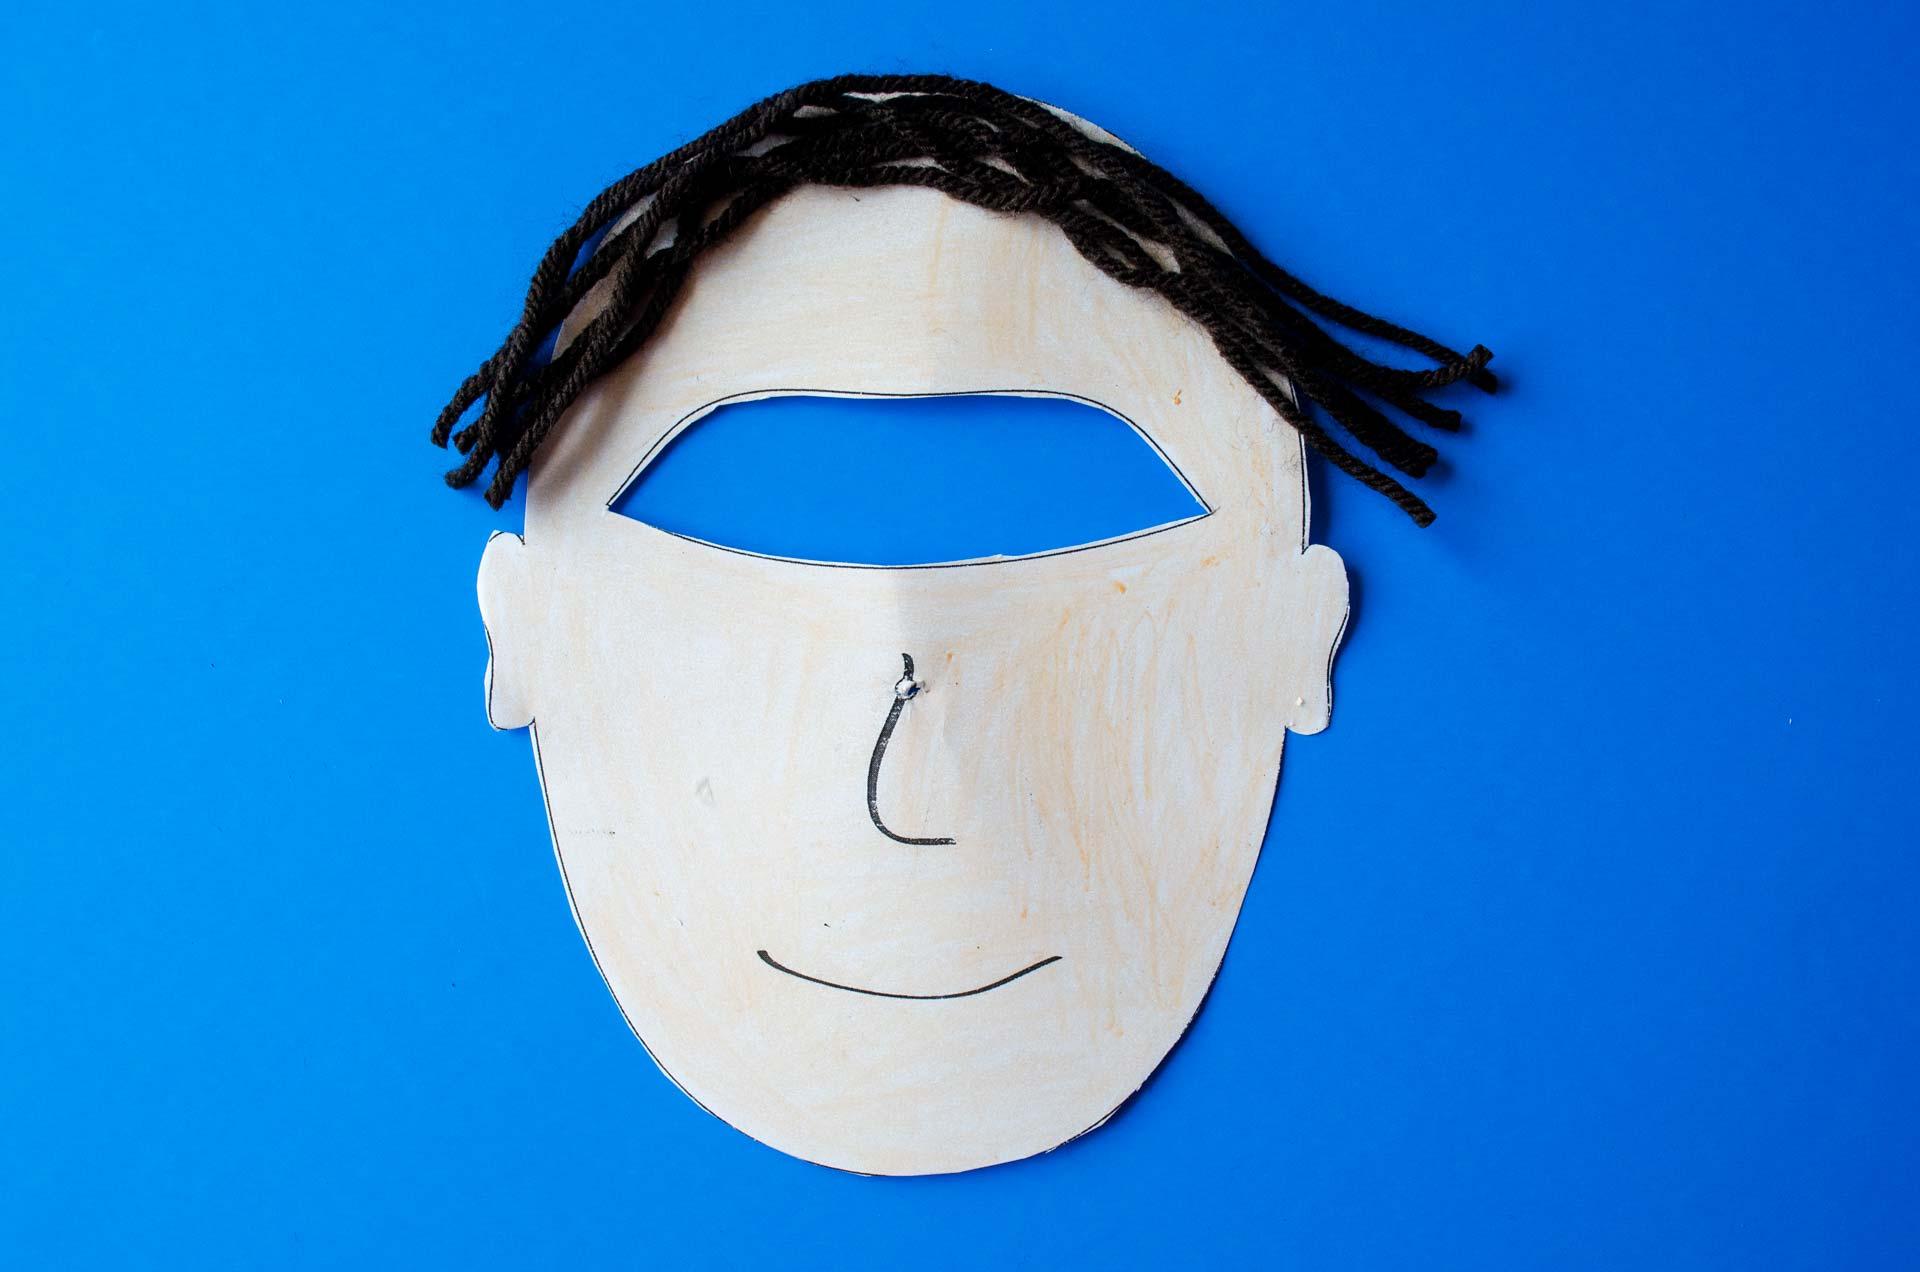 Man face illustration on blue background with black yarn hair glued on.